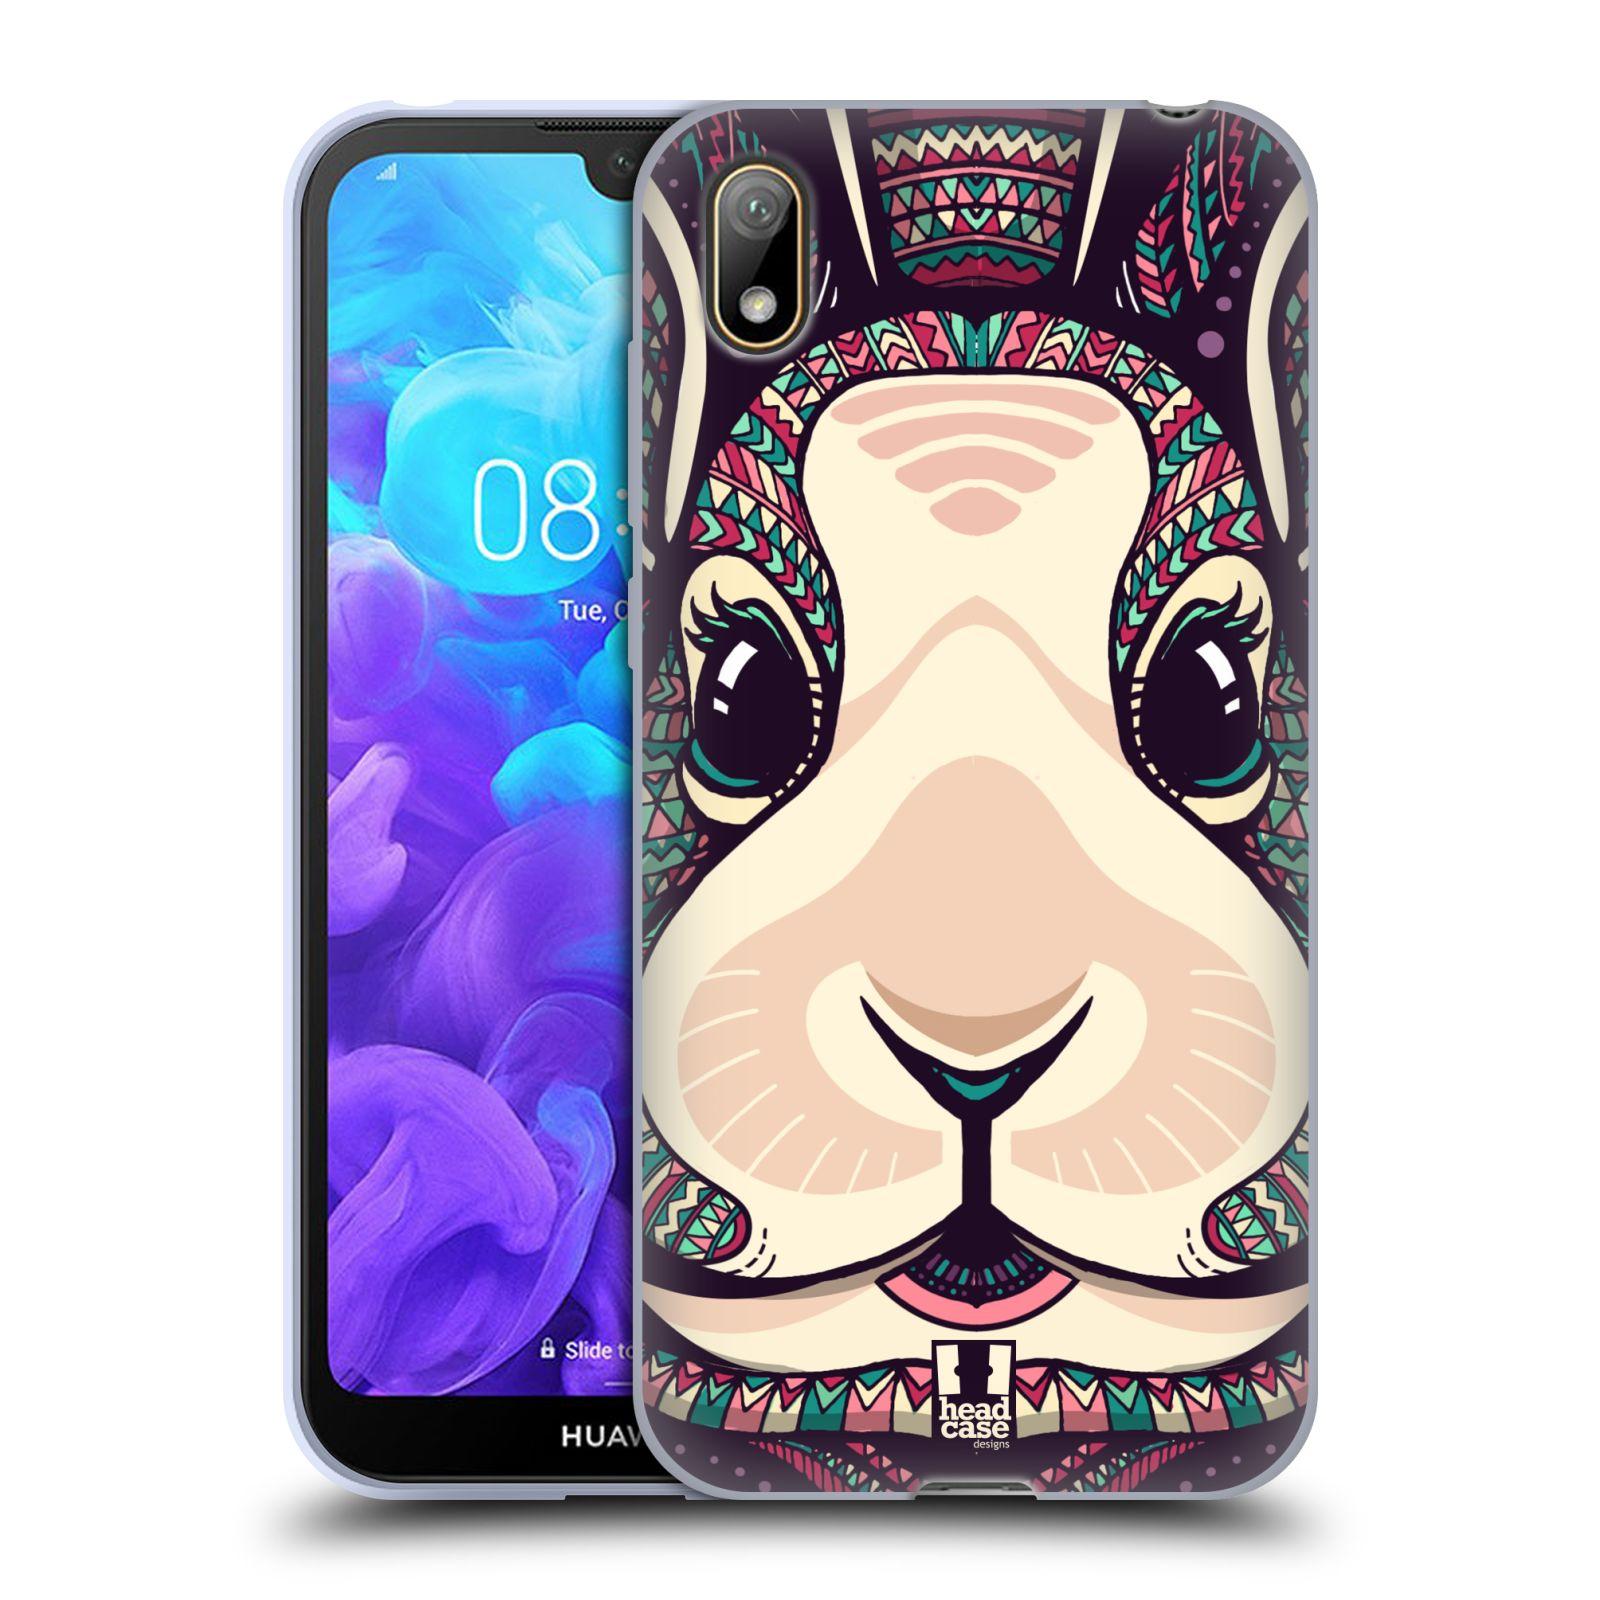 Silikonové pouzdro na mobil Huawei Y5 (2019) - Head Case - AZTEC ZAJÍČEK